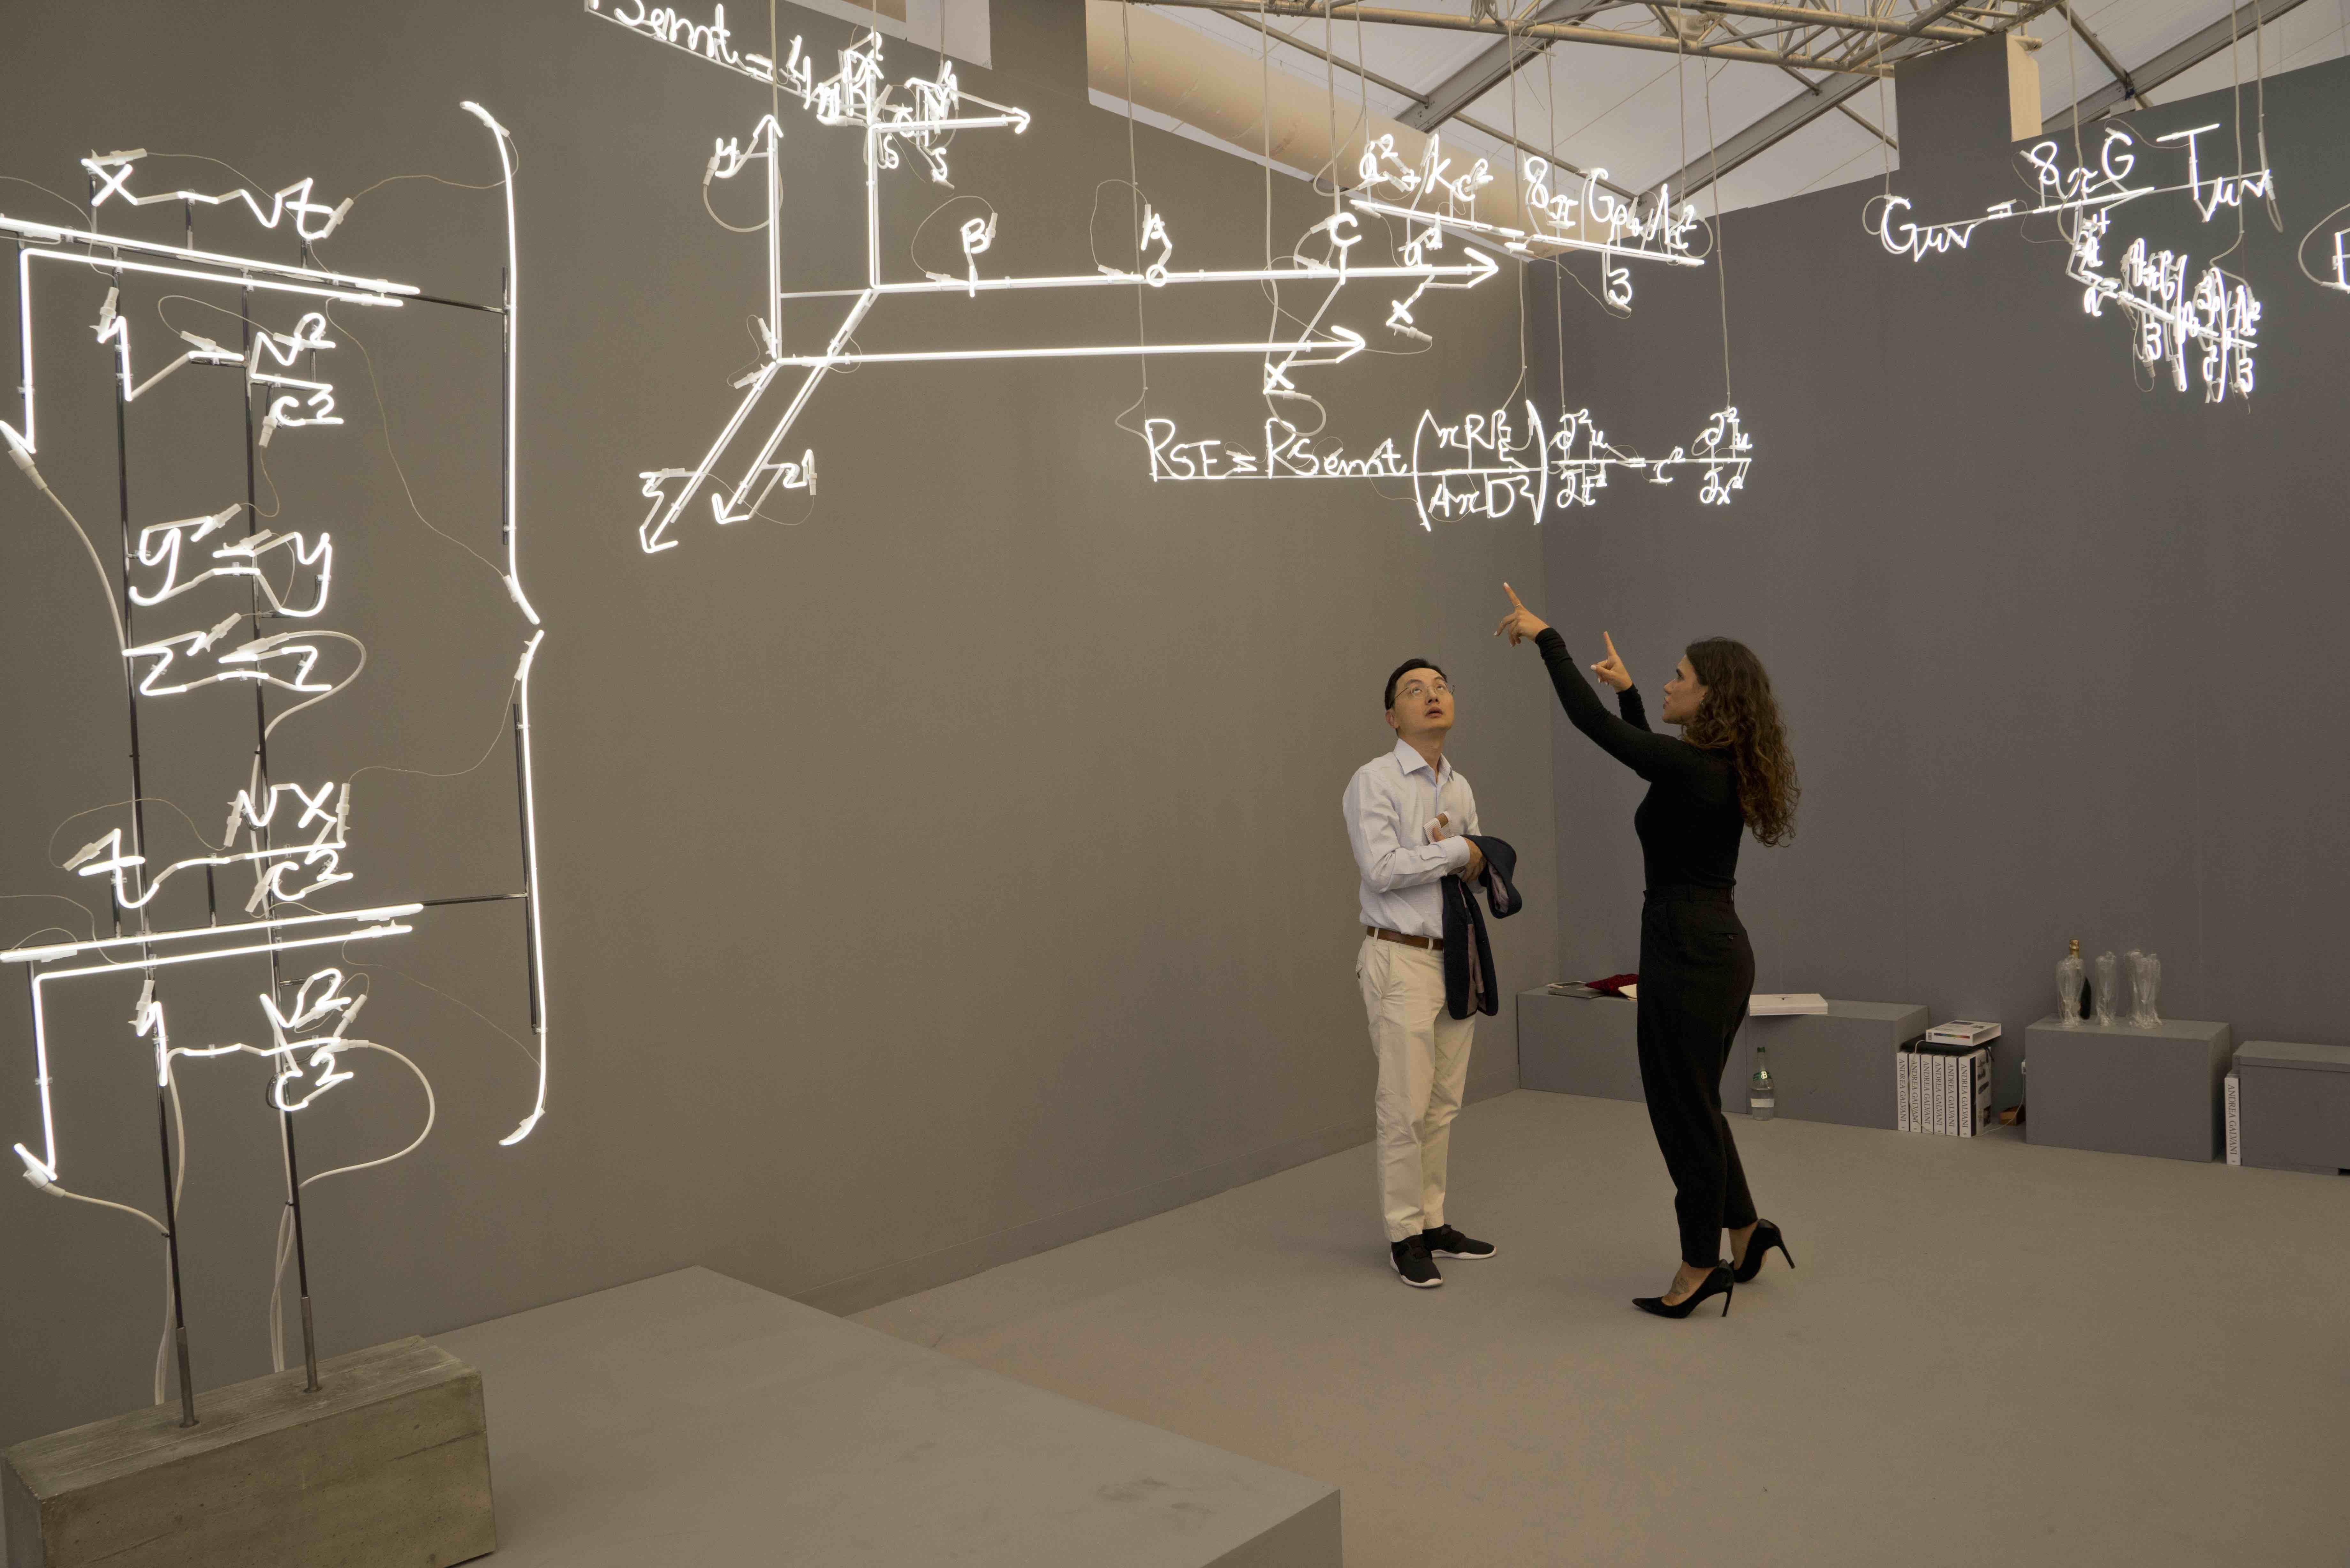 Frieze Explores The Possibilities Of Political Activism In Art Diagram Our Trebuchet Photo Credit Julio Etchart